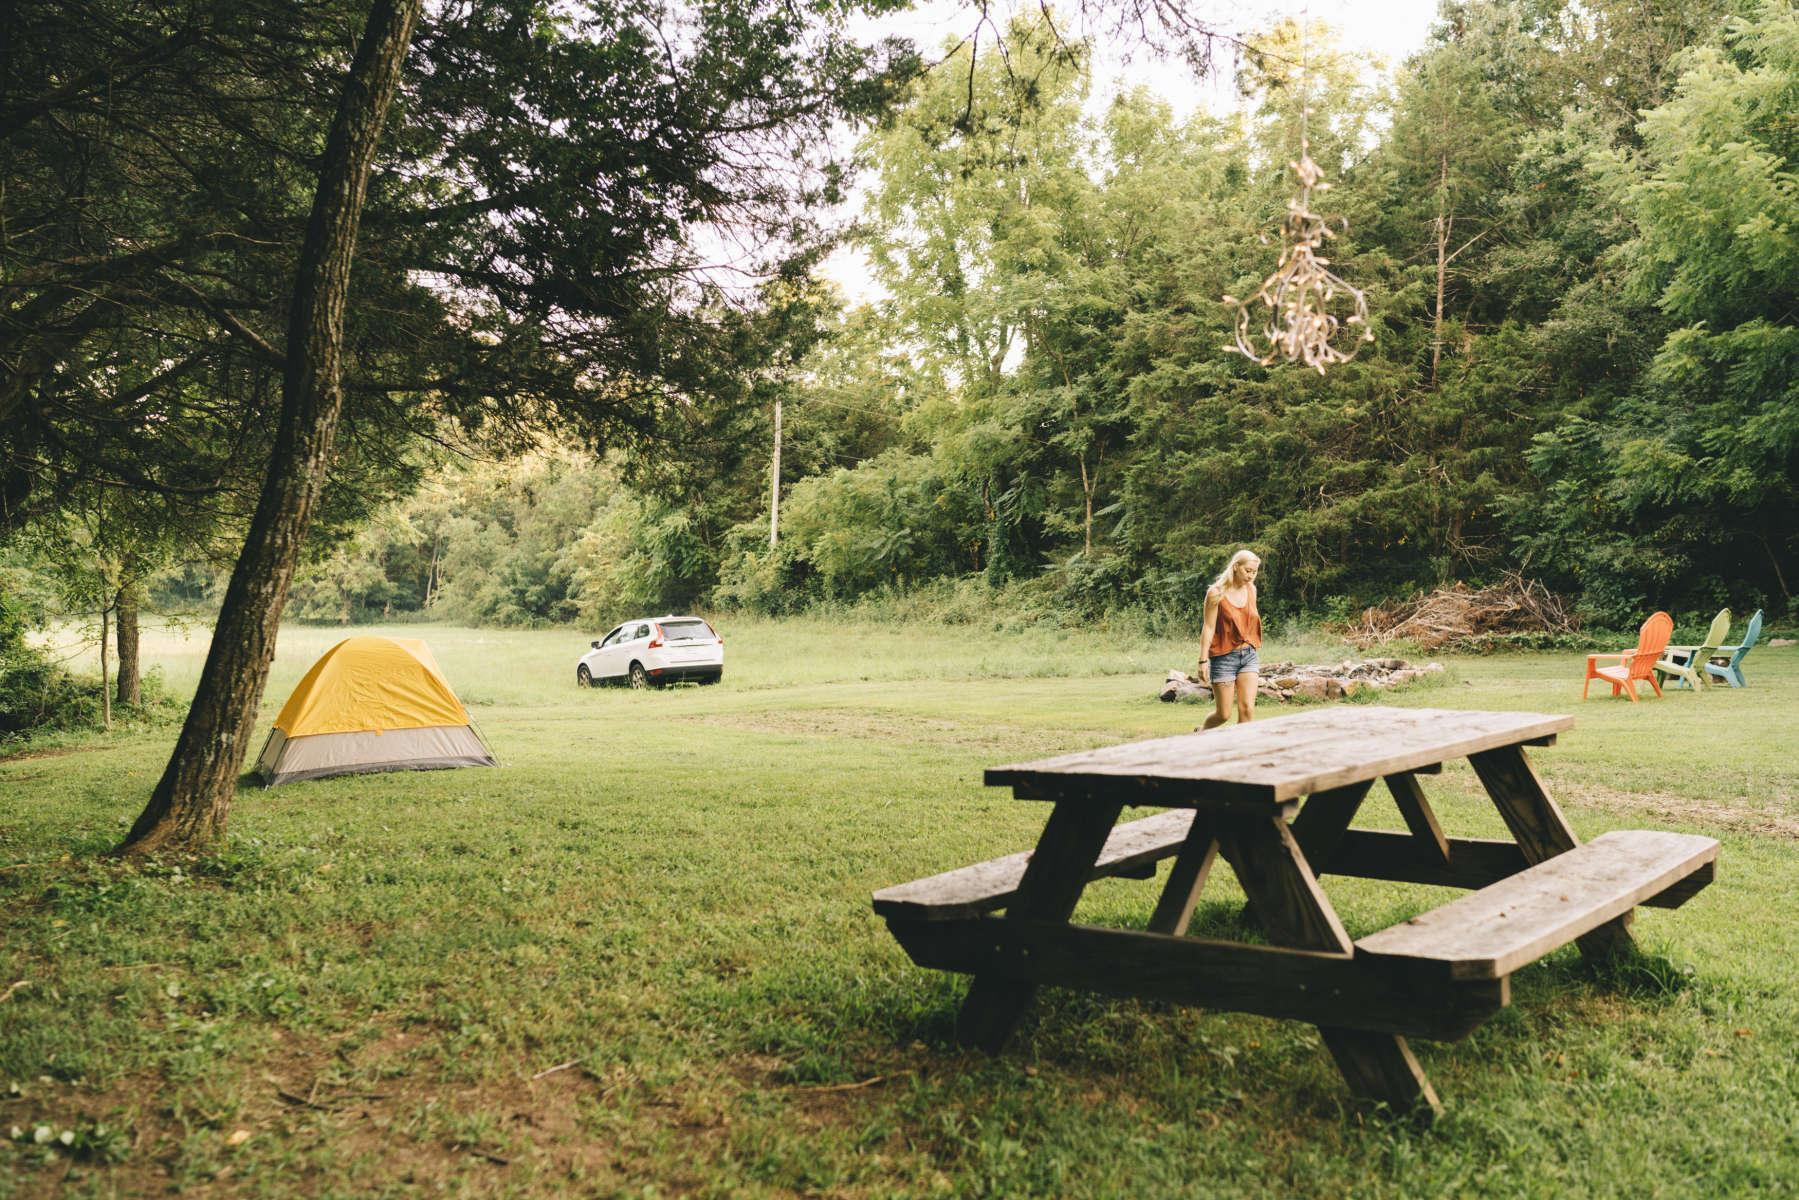 ... Photo At Shenandoah Mountain Farm Cole S.u0027s Photo At Shenandoah  Mountain Farm Cole S.u0027s Photo At Shenandoah Mountain Farm Cole S.u0027s Photo  At Shenandoah ...